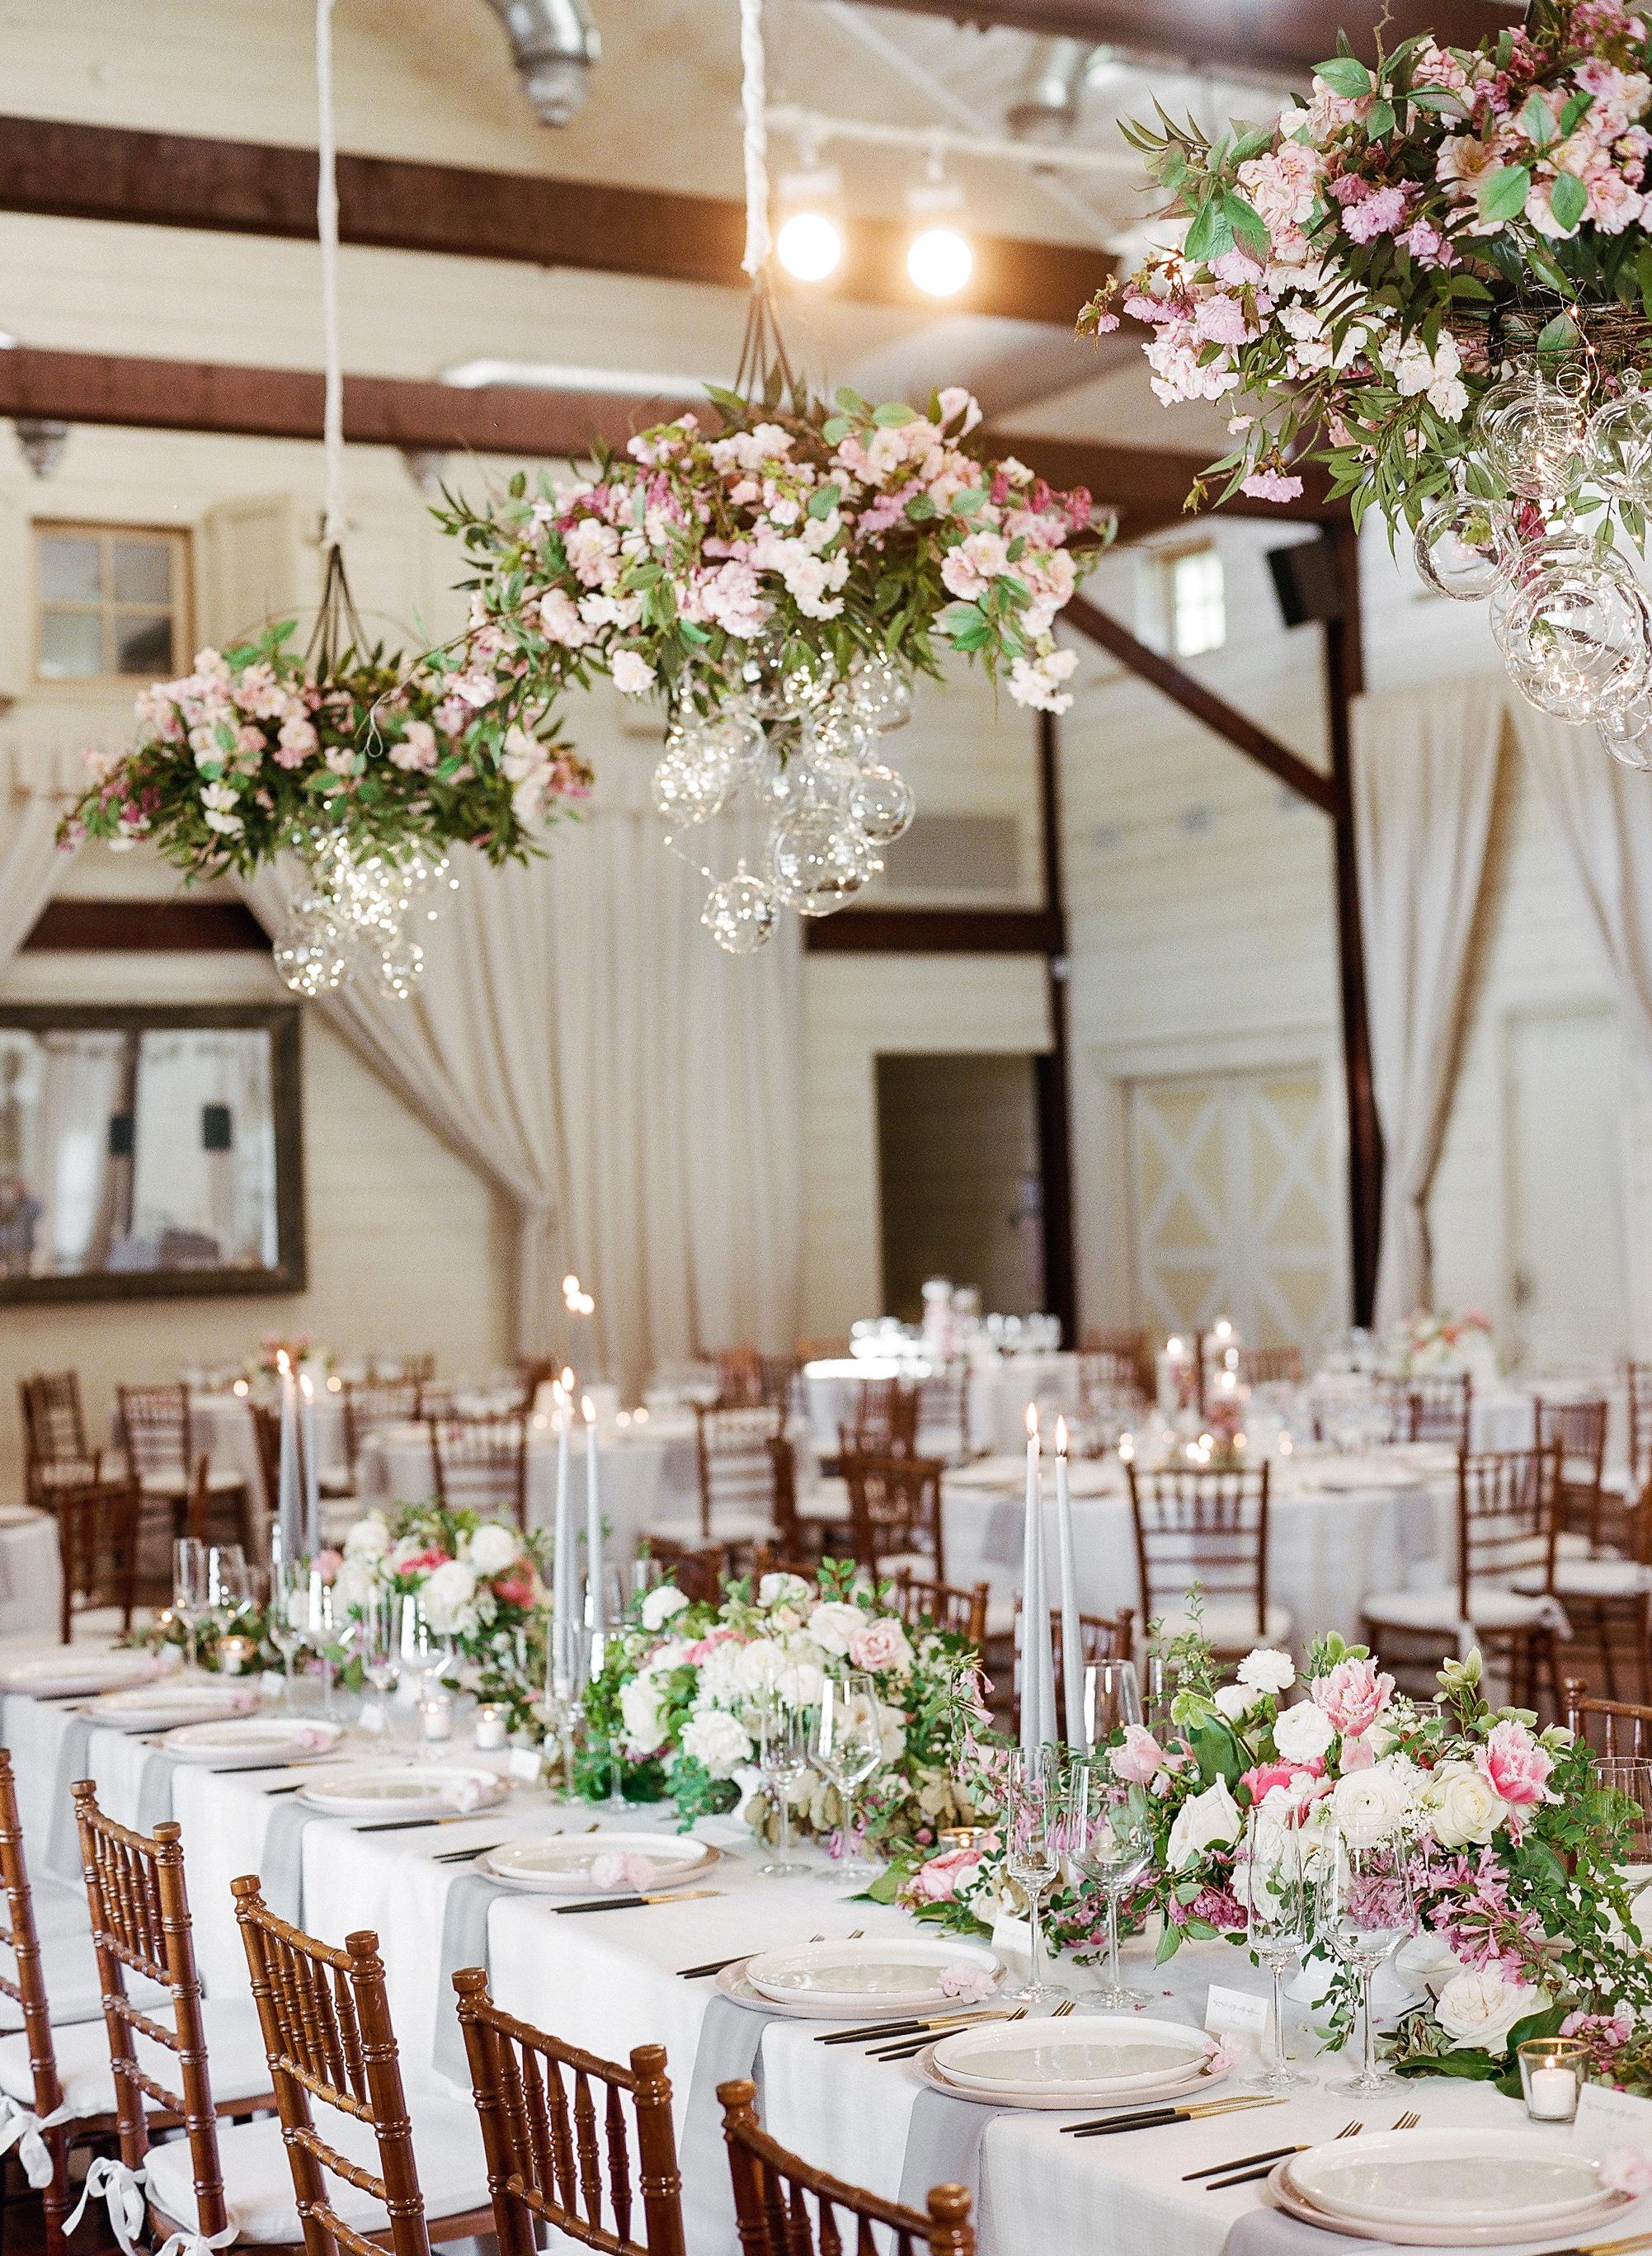 mechelle julia wedding reception tables and centerpieces